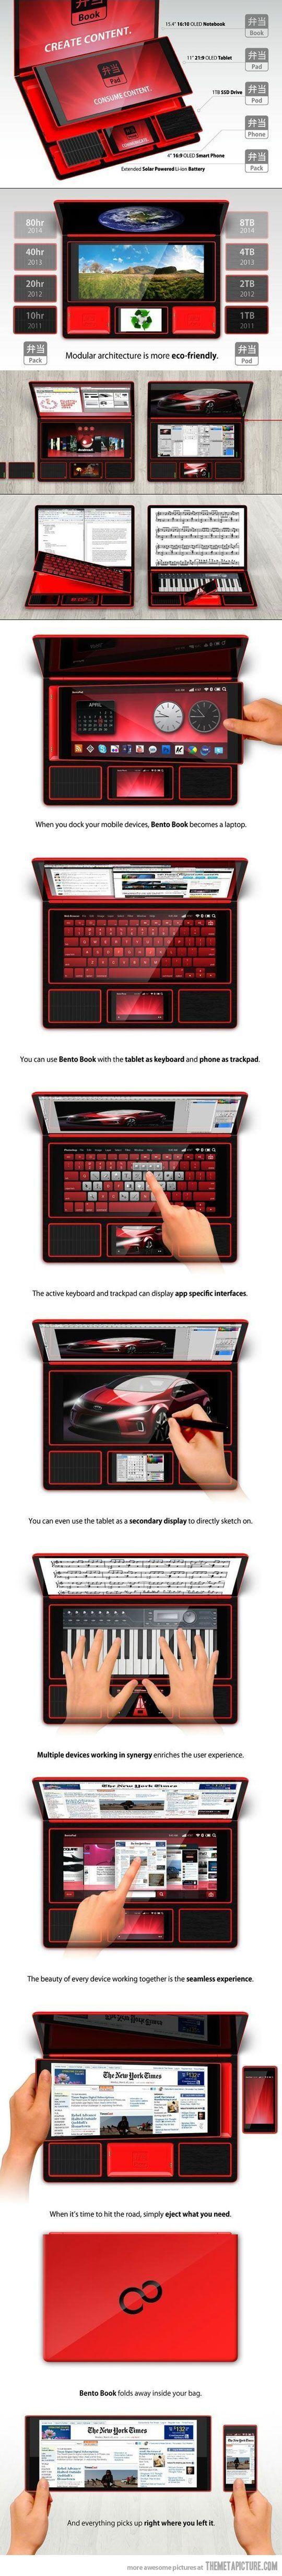 futuristic phone Geeky Pinterest